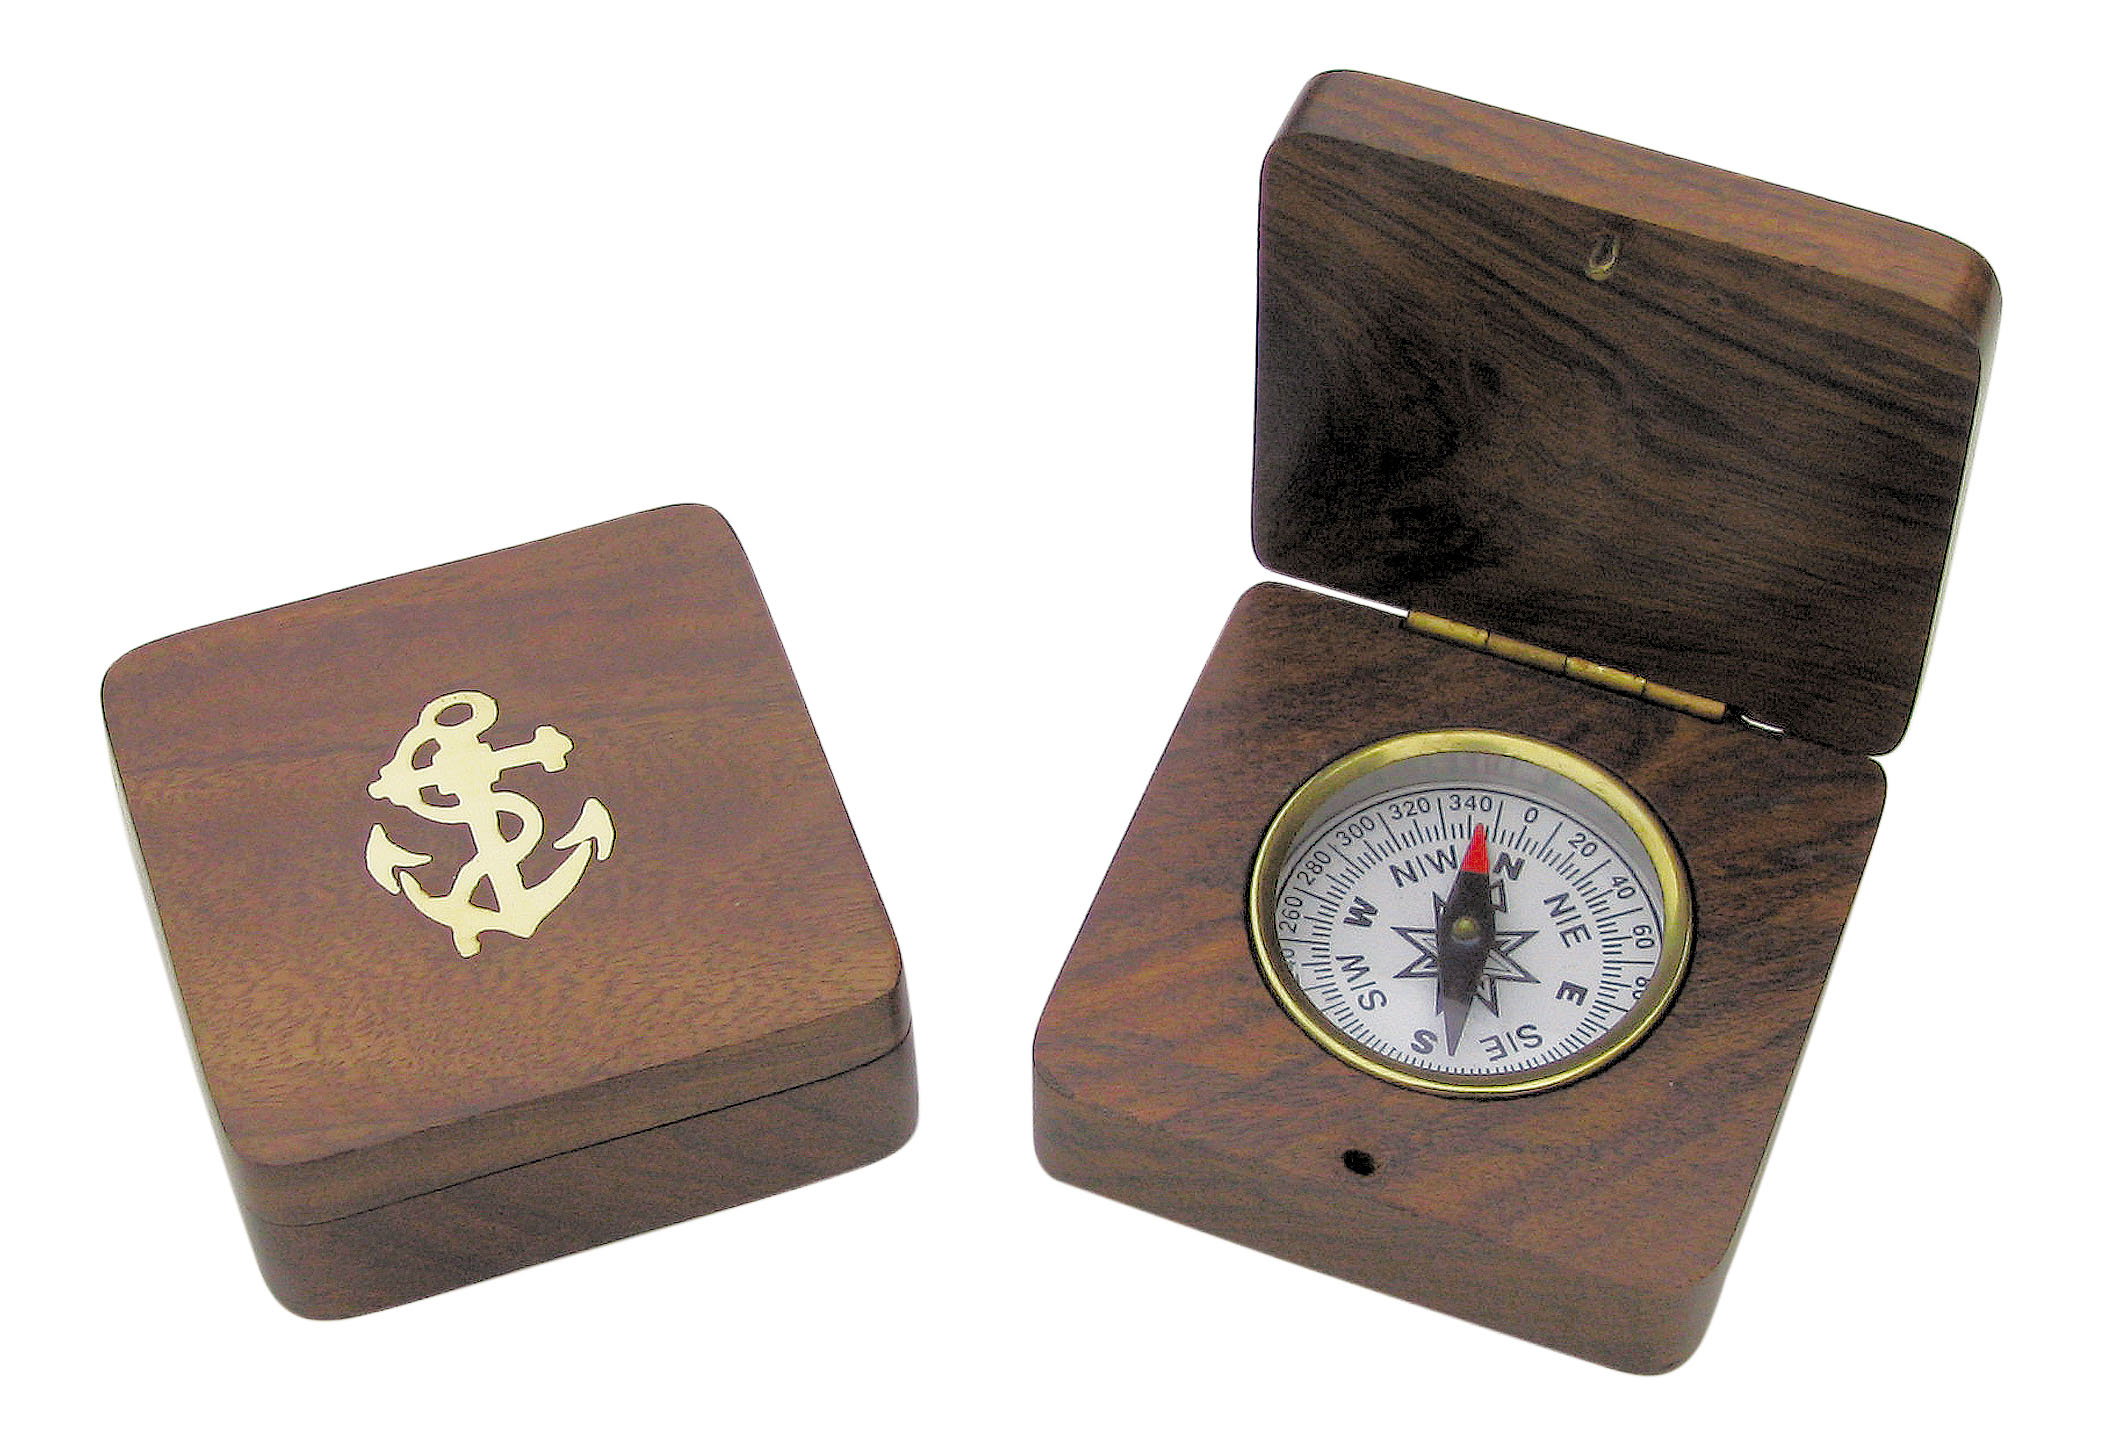 Kompass perfekt f r die maritime dekoration for Maritime wohnaccessoires